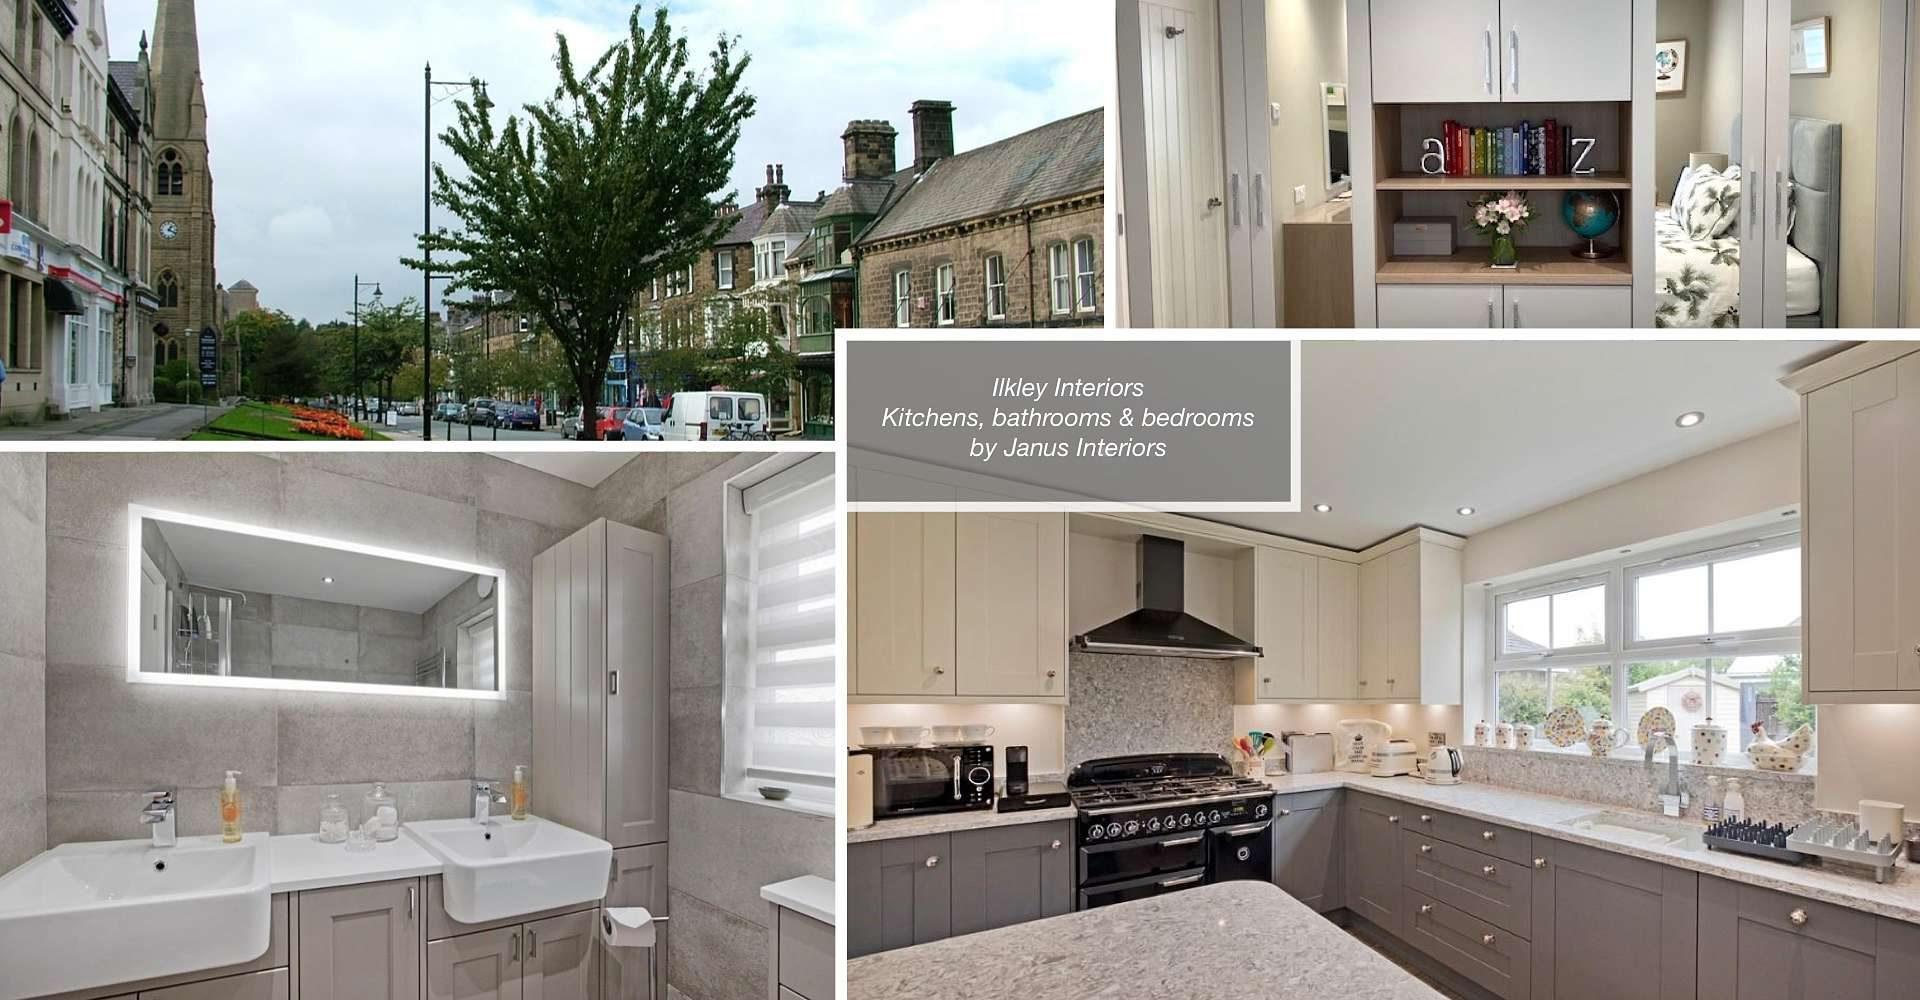 montage of ilkley town centre, ilkley kitchen, ilkley bathroom and ilkley bedroom interiors